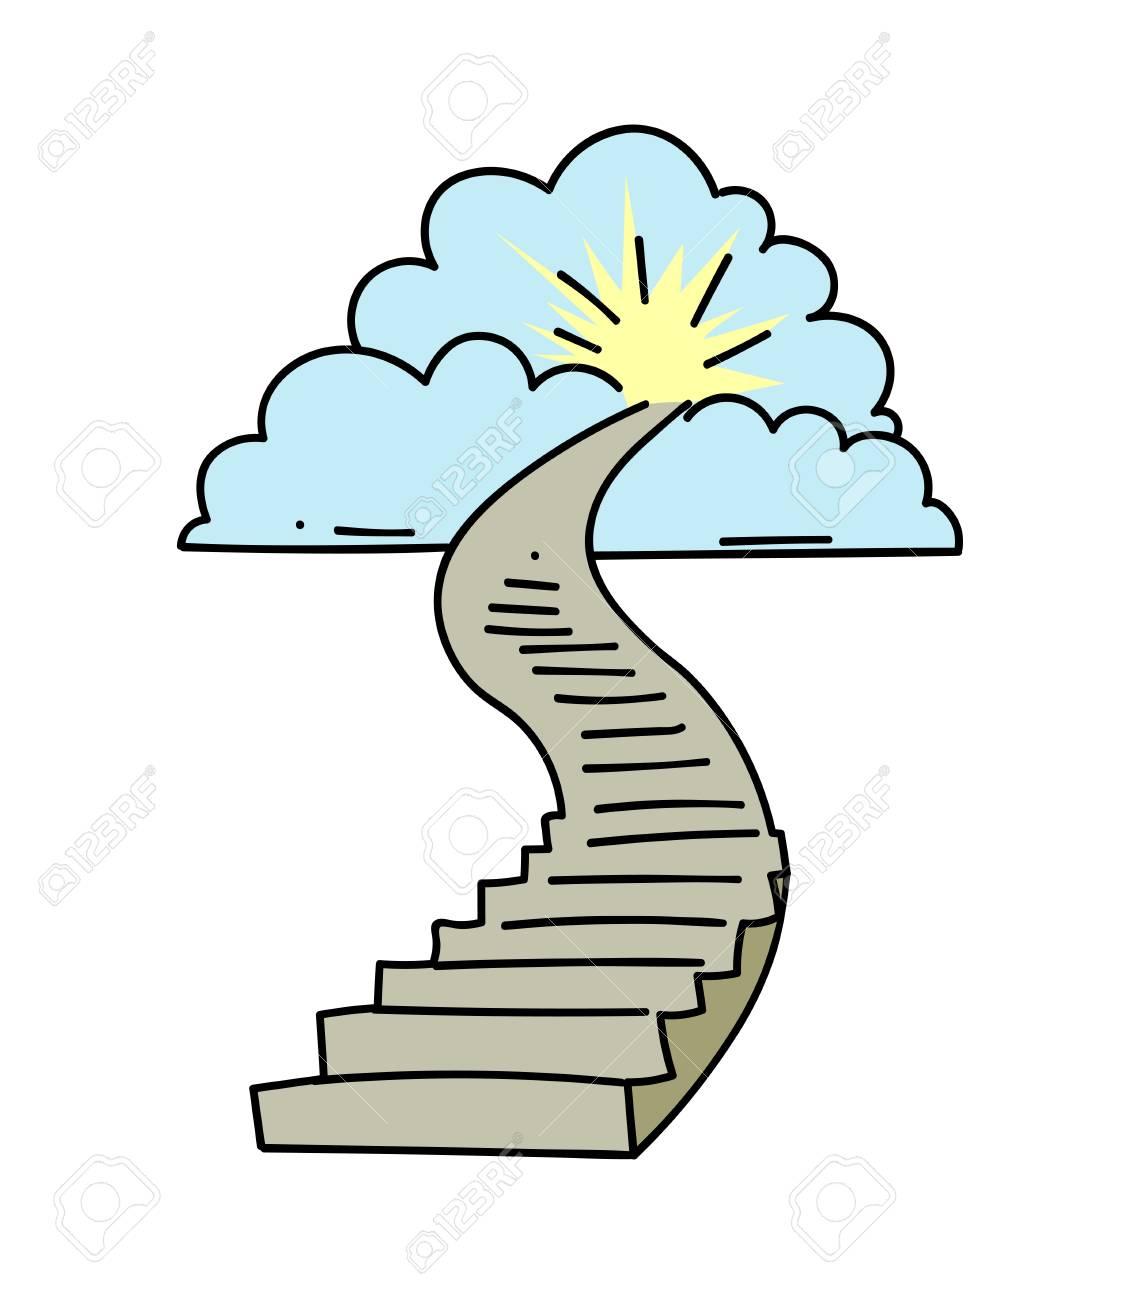 Hand drawn cartoon image of stairway to heaven. - 86999311